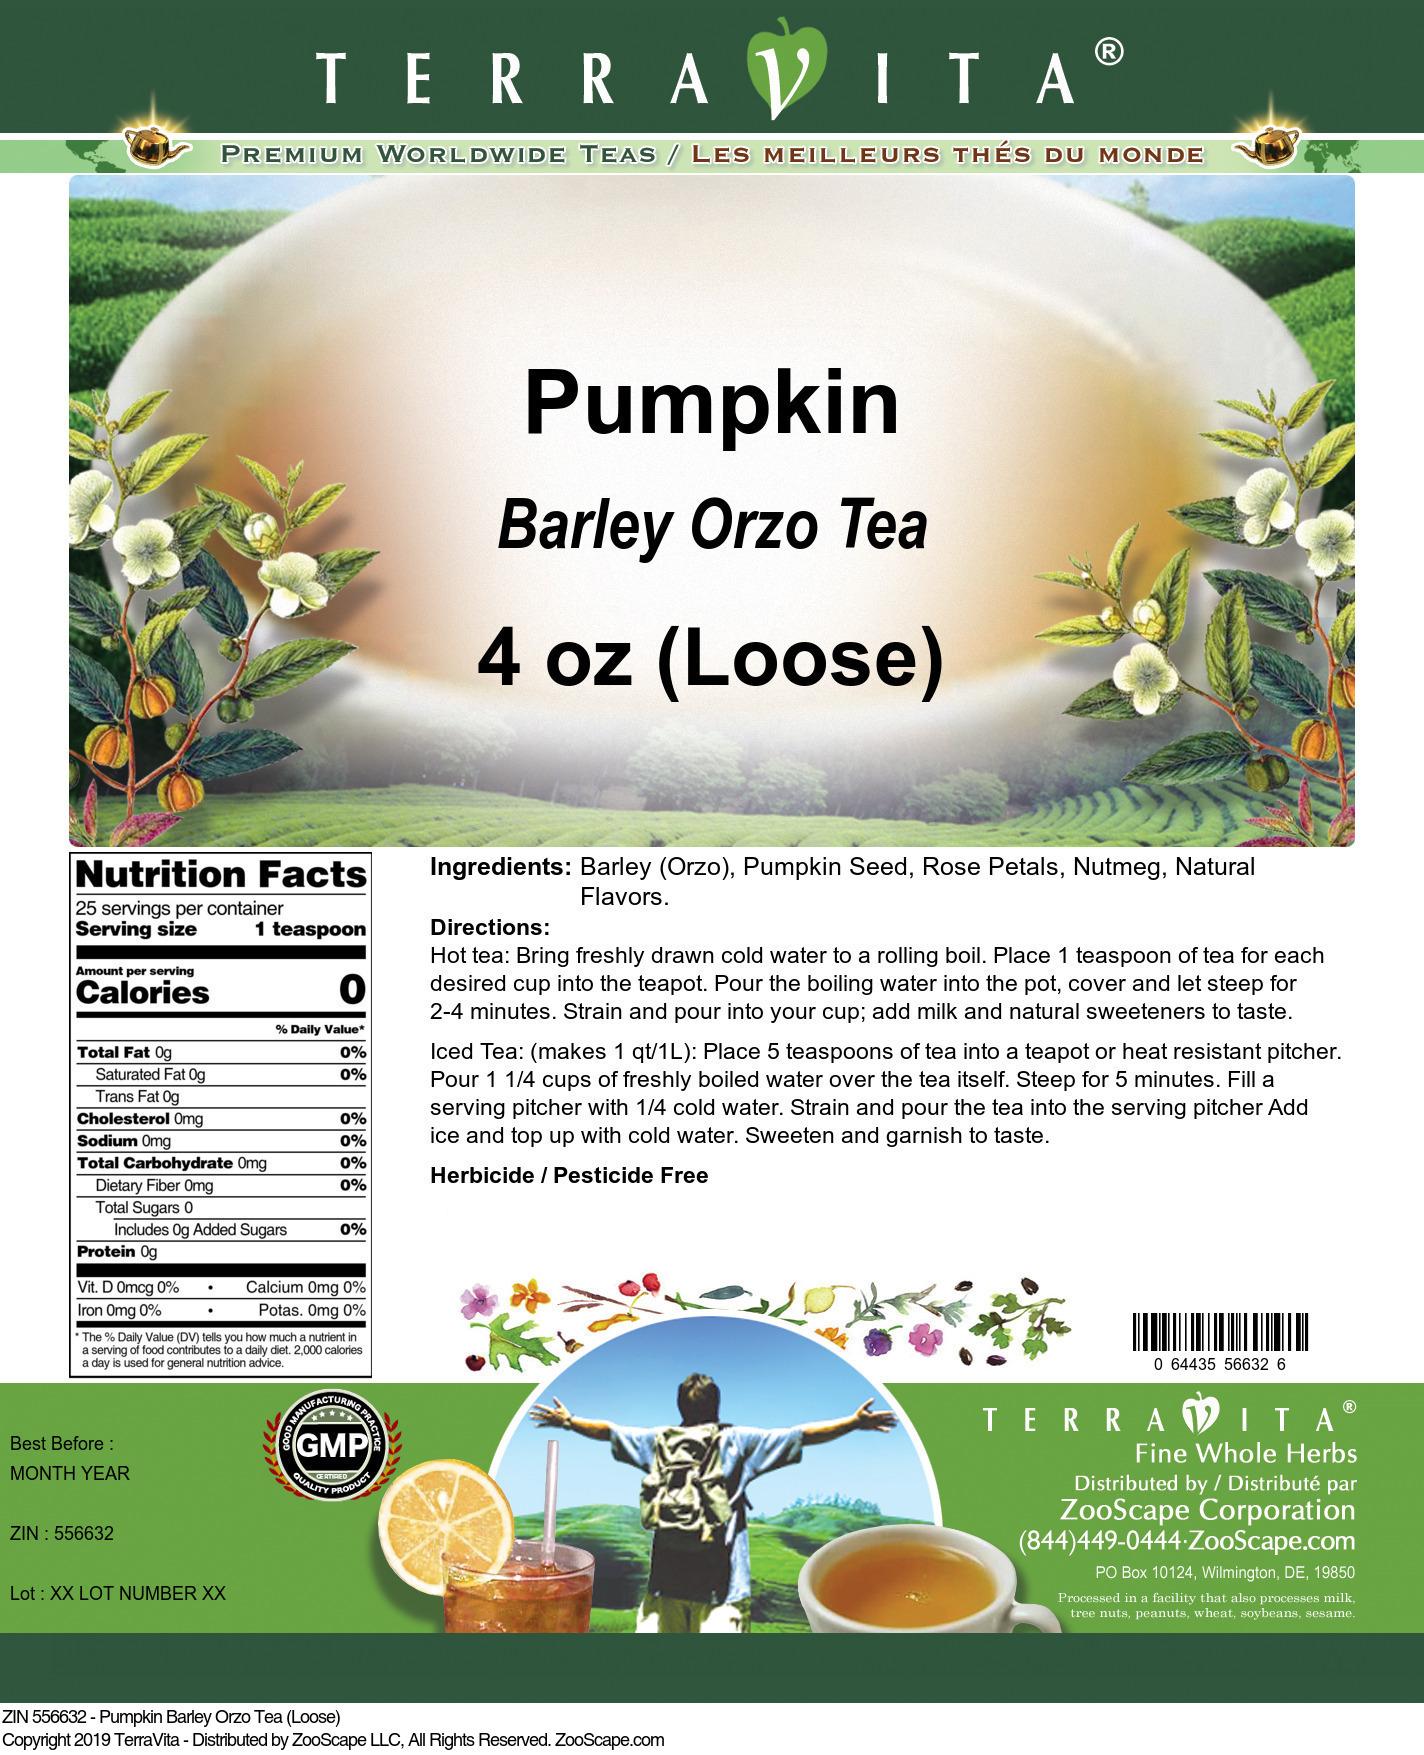 Pumpkin Barley Orzo